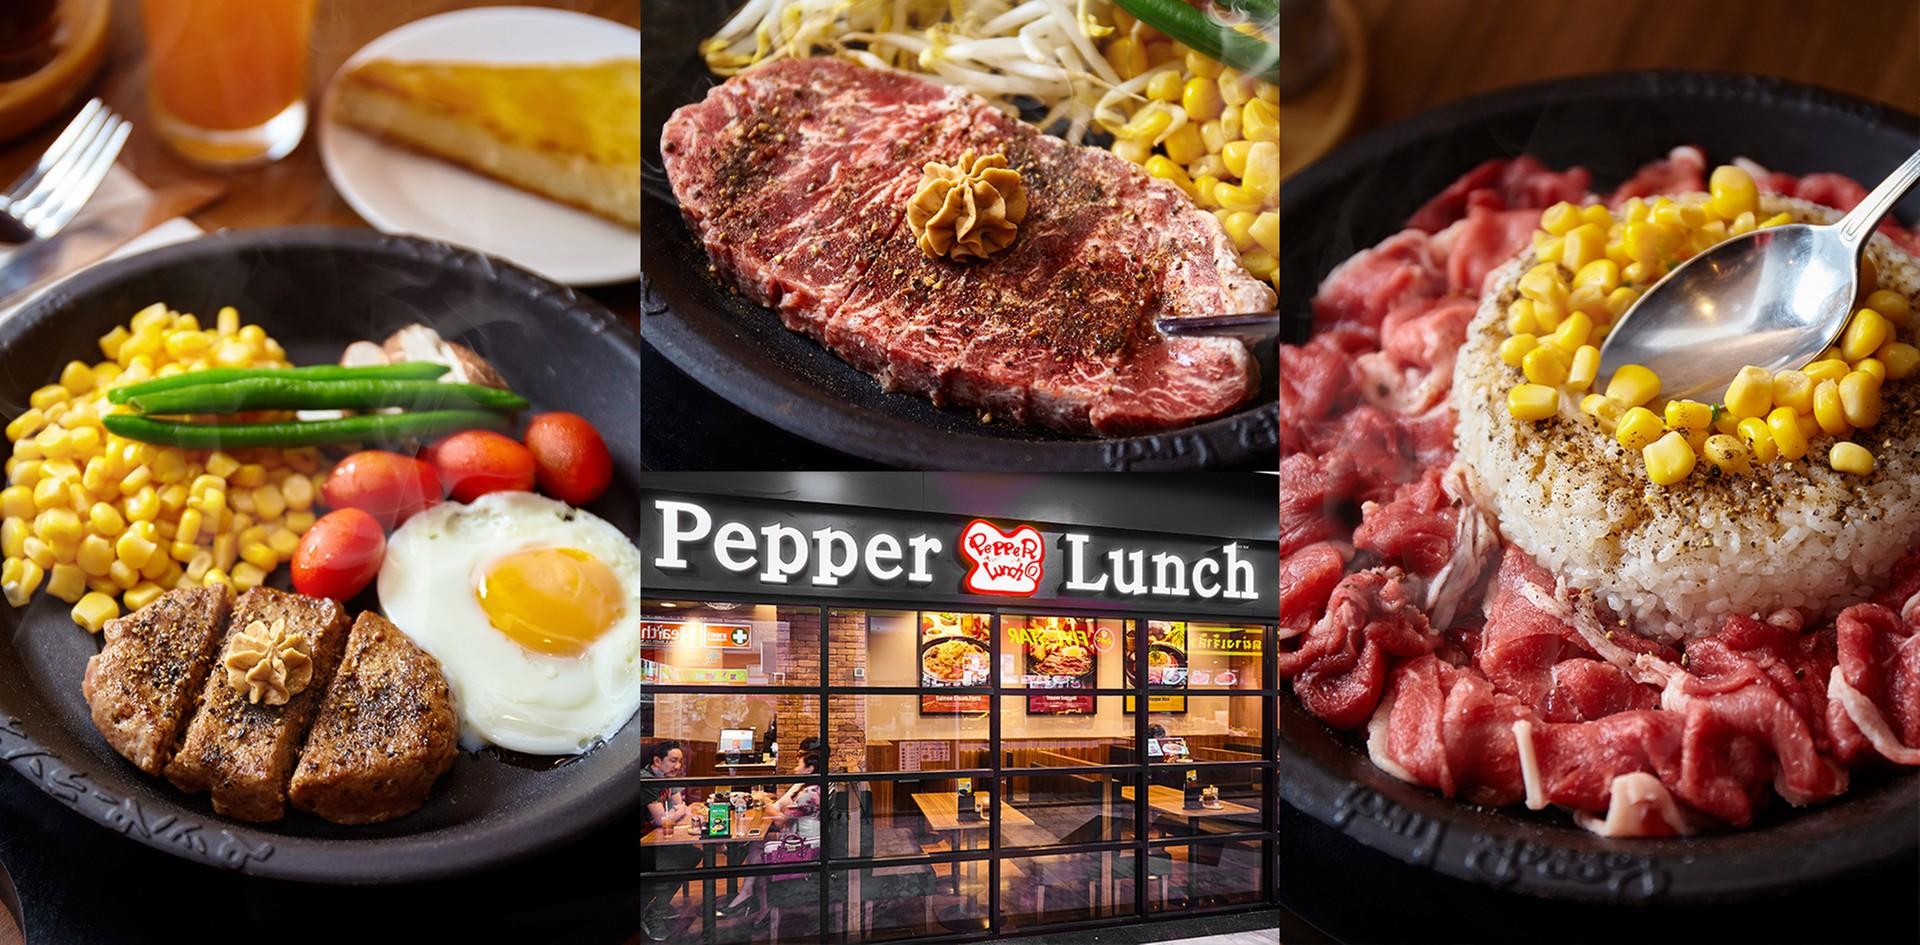 """Pepper Lunch"" เสิร์ฟเมนูจานร้อนฉู่ฉ่าาา ฟินยันคำสุดท้าย!"